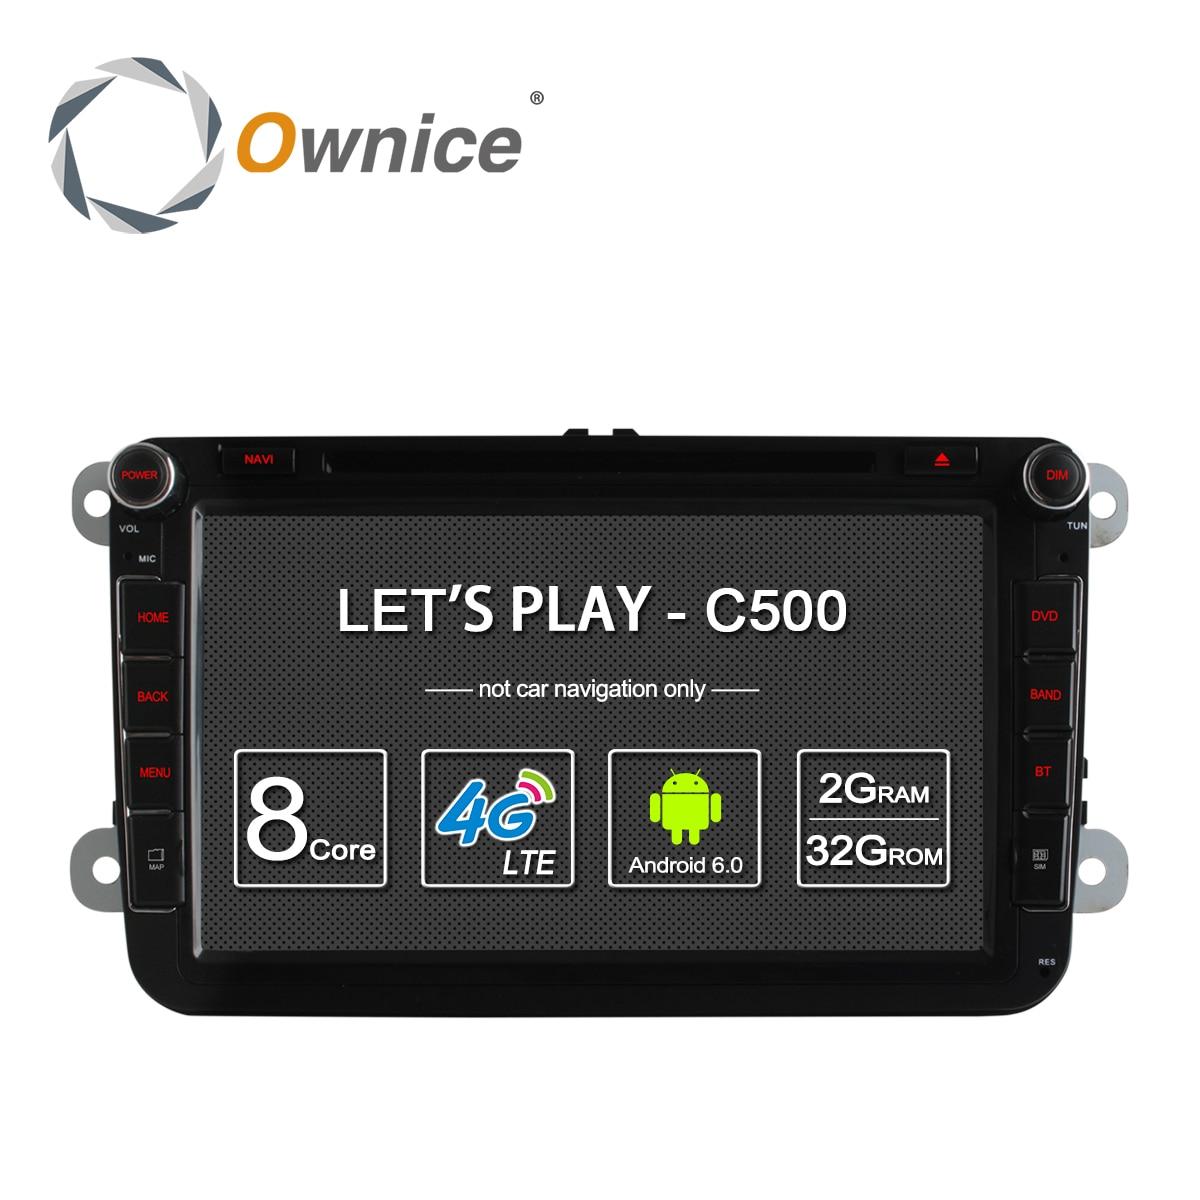 imágenes para 4G SIM LTE Red Ownice C500 Octa 8 Core Android 6.0 2G RAM 2 Din Coche Reproductor de DVD GPS Navi Radio Para VW Skoda Octavia 2